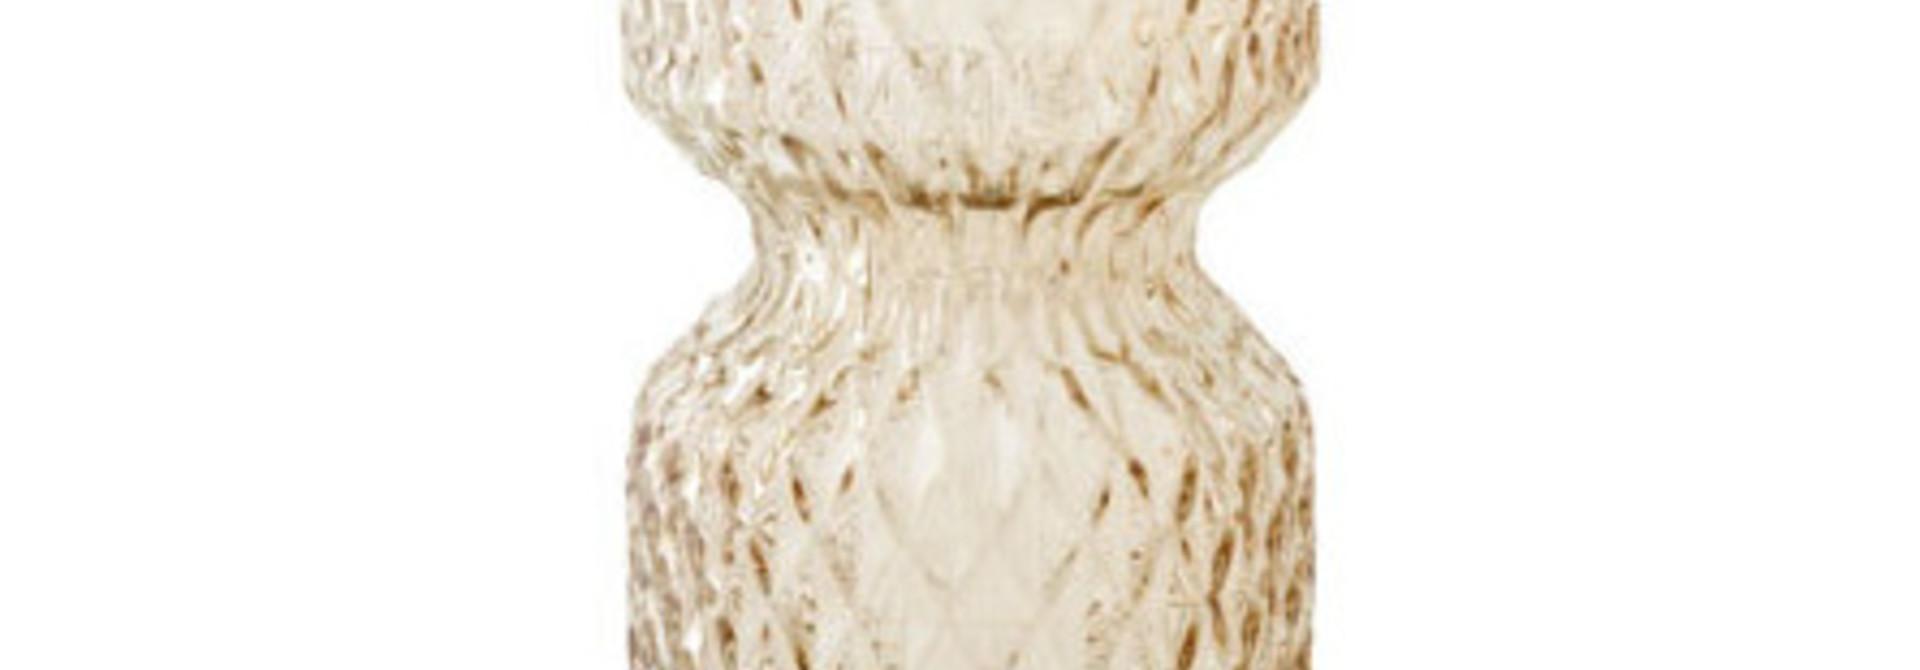 Vaas Firenze - Beige Glas D7 x H15 cm